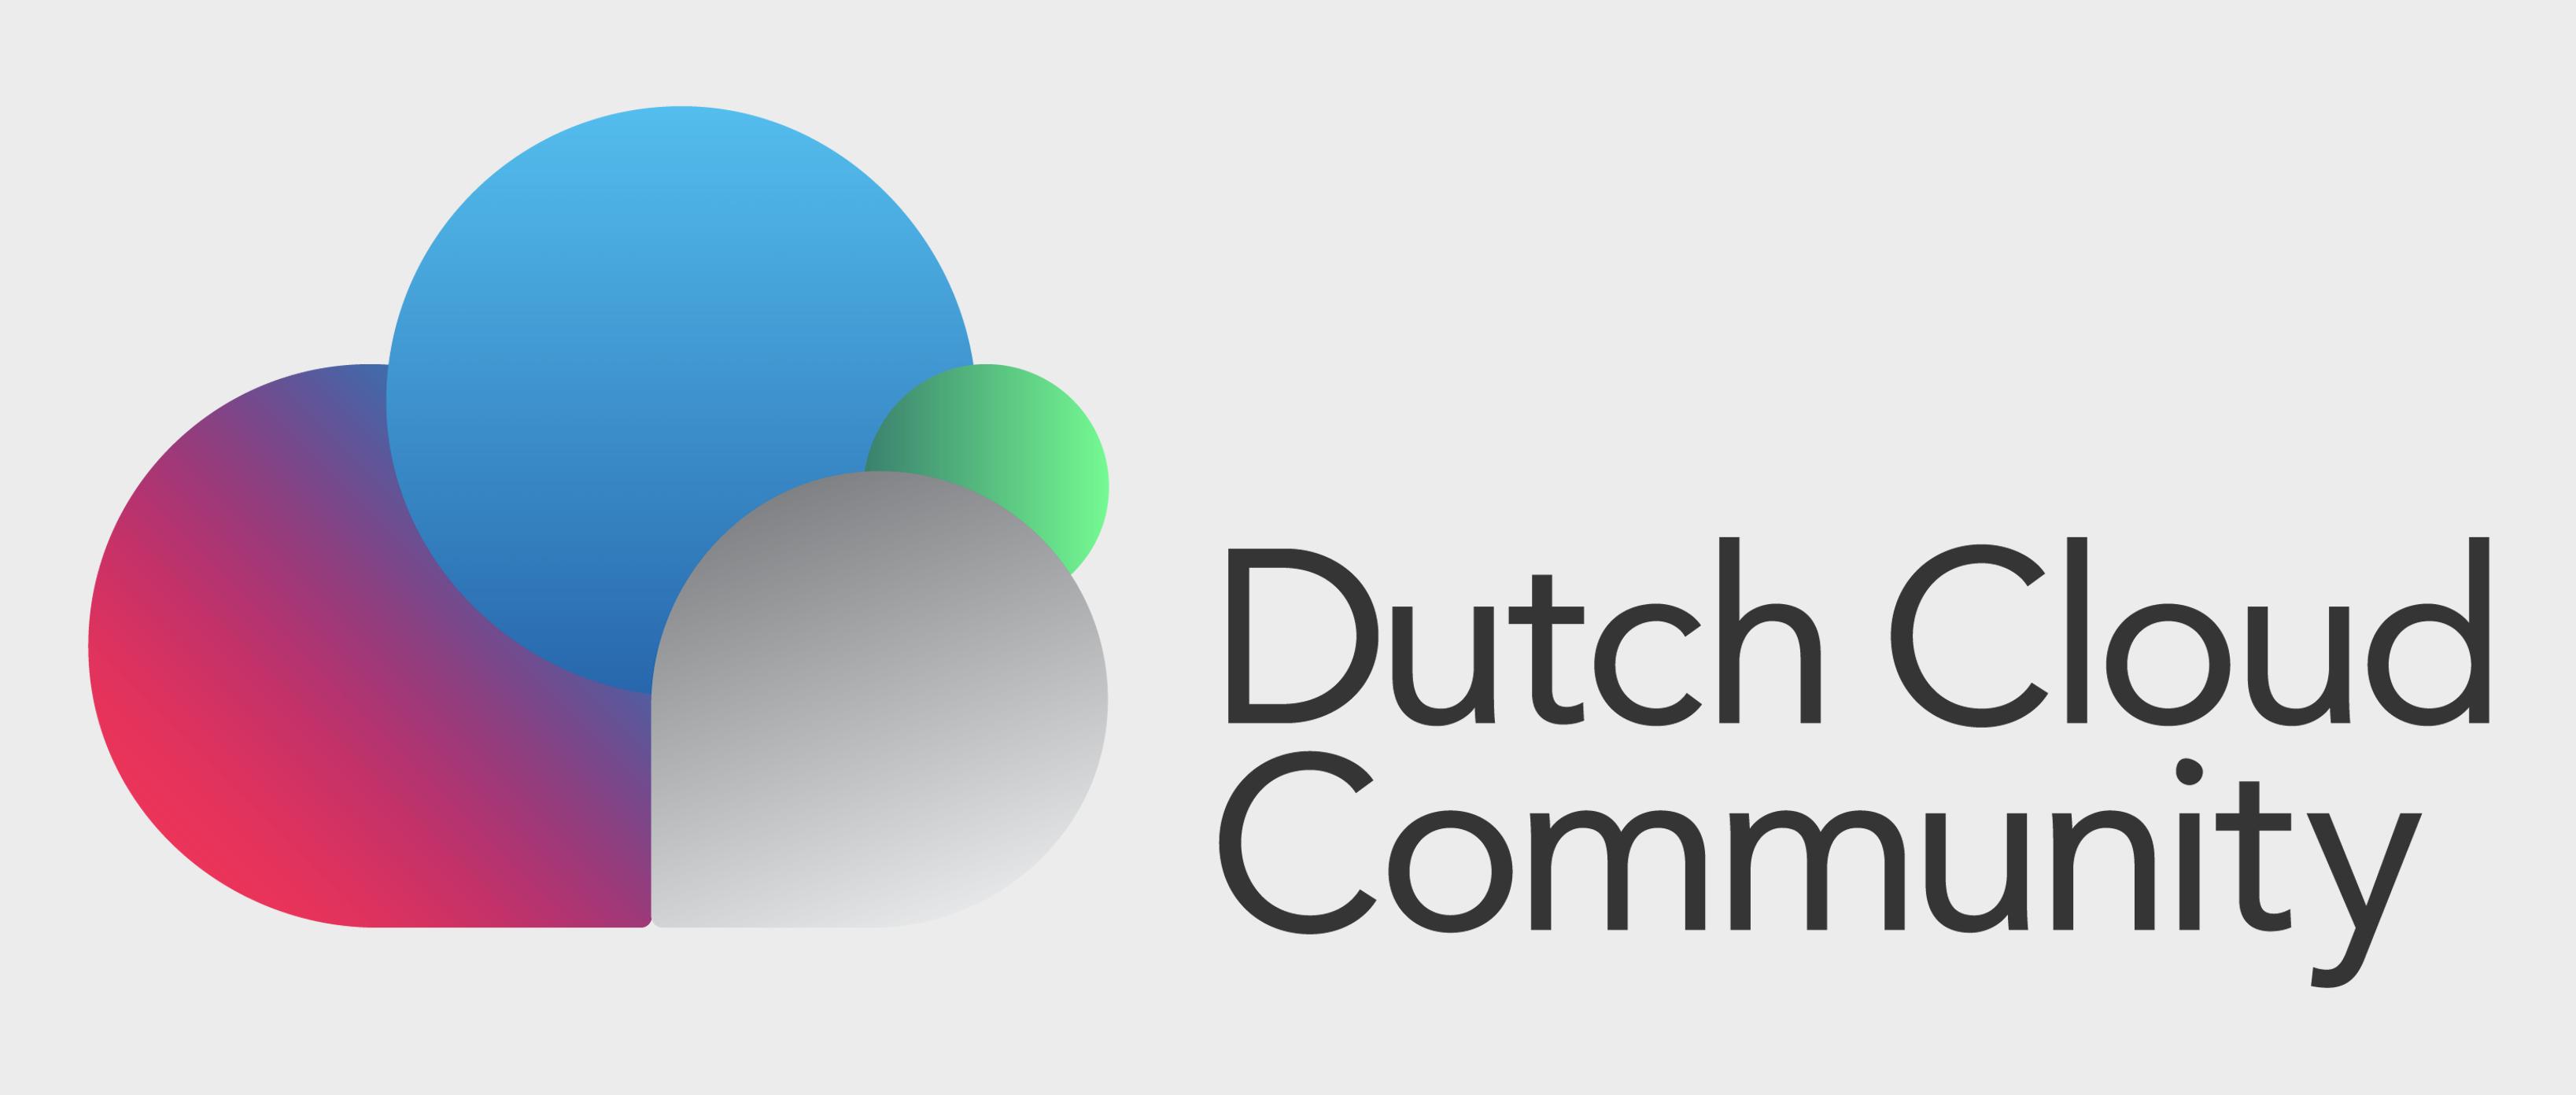 Dutch Cloud Community